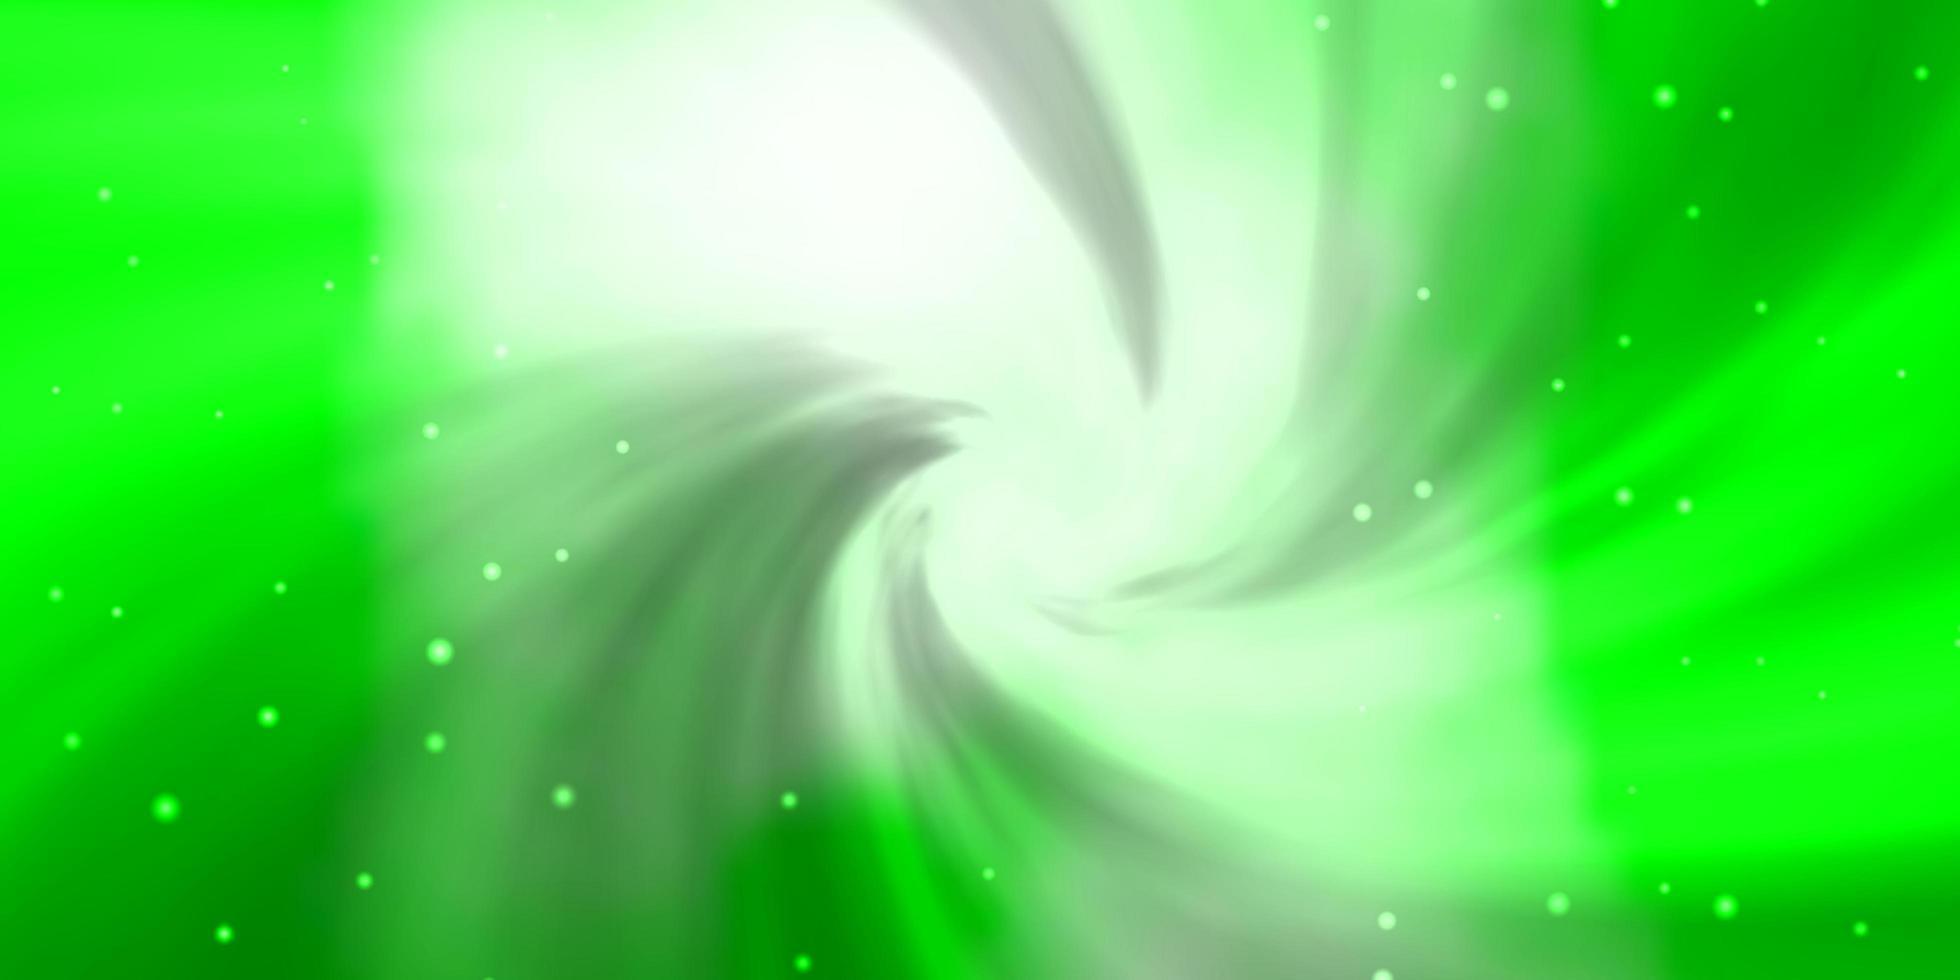 layout de vetor verde claro com estrelas brilhantes.